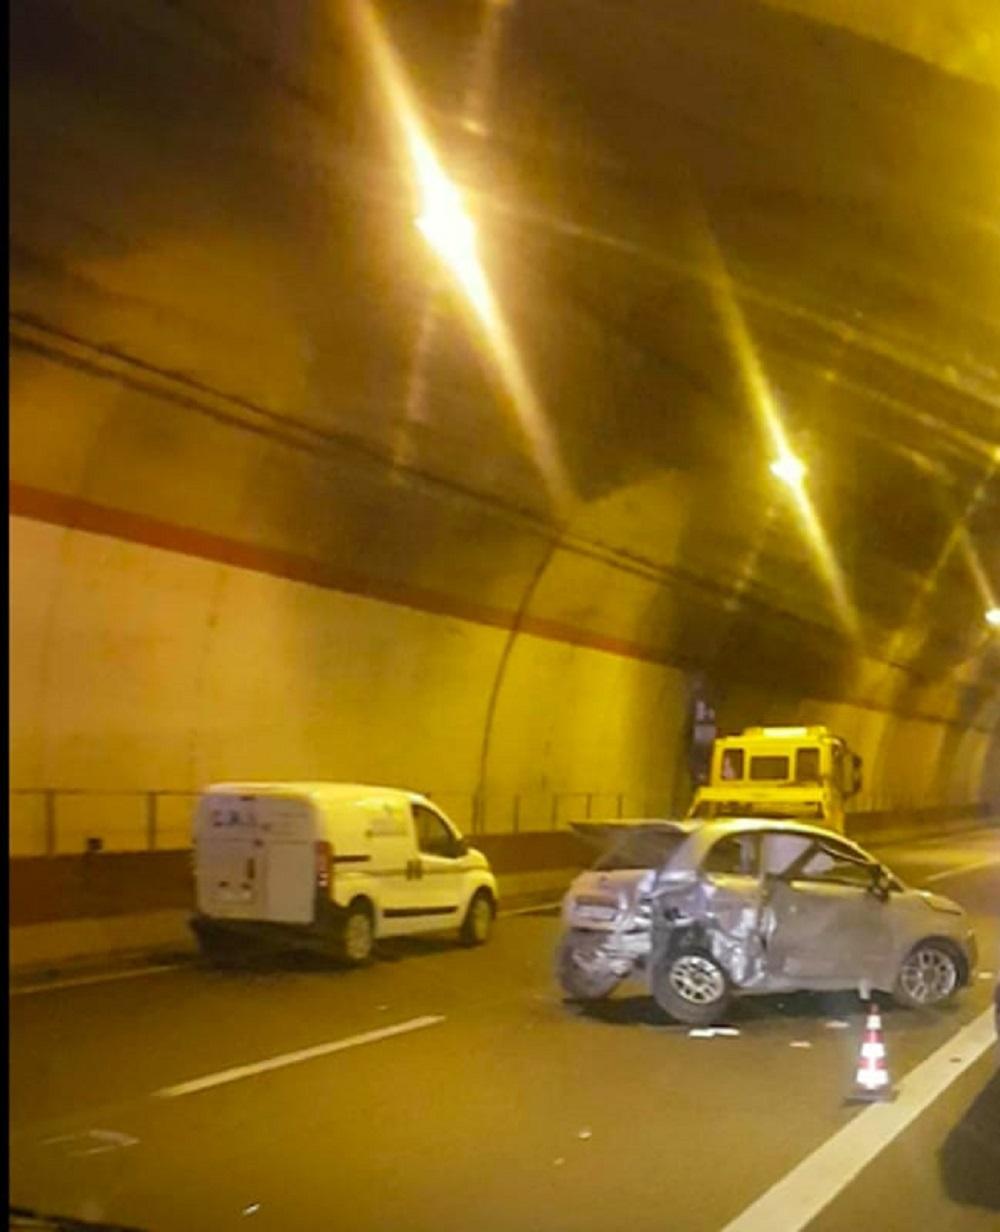 Incidente in galleria sulla Catania-Siracusa: c'è una vittima